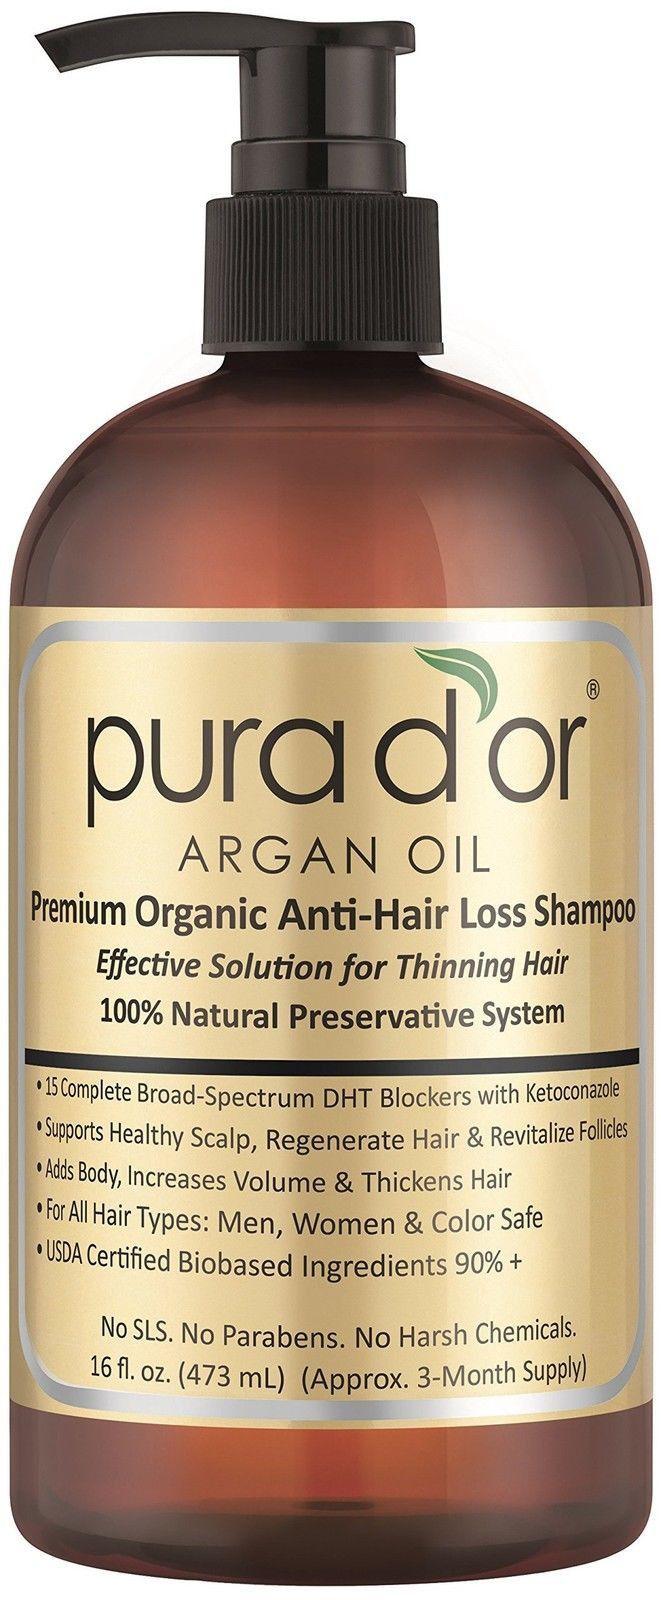 Pura d'or Premium Organic Argan Oil Anti-Hair Loss Shampoo (Gold Label) 16 Fl...